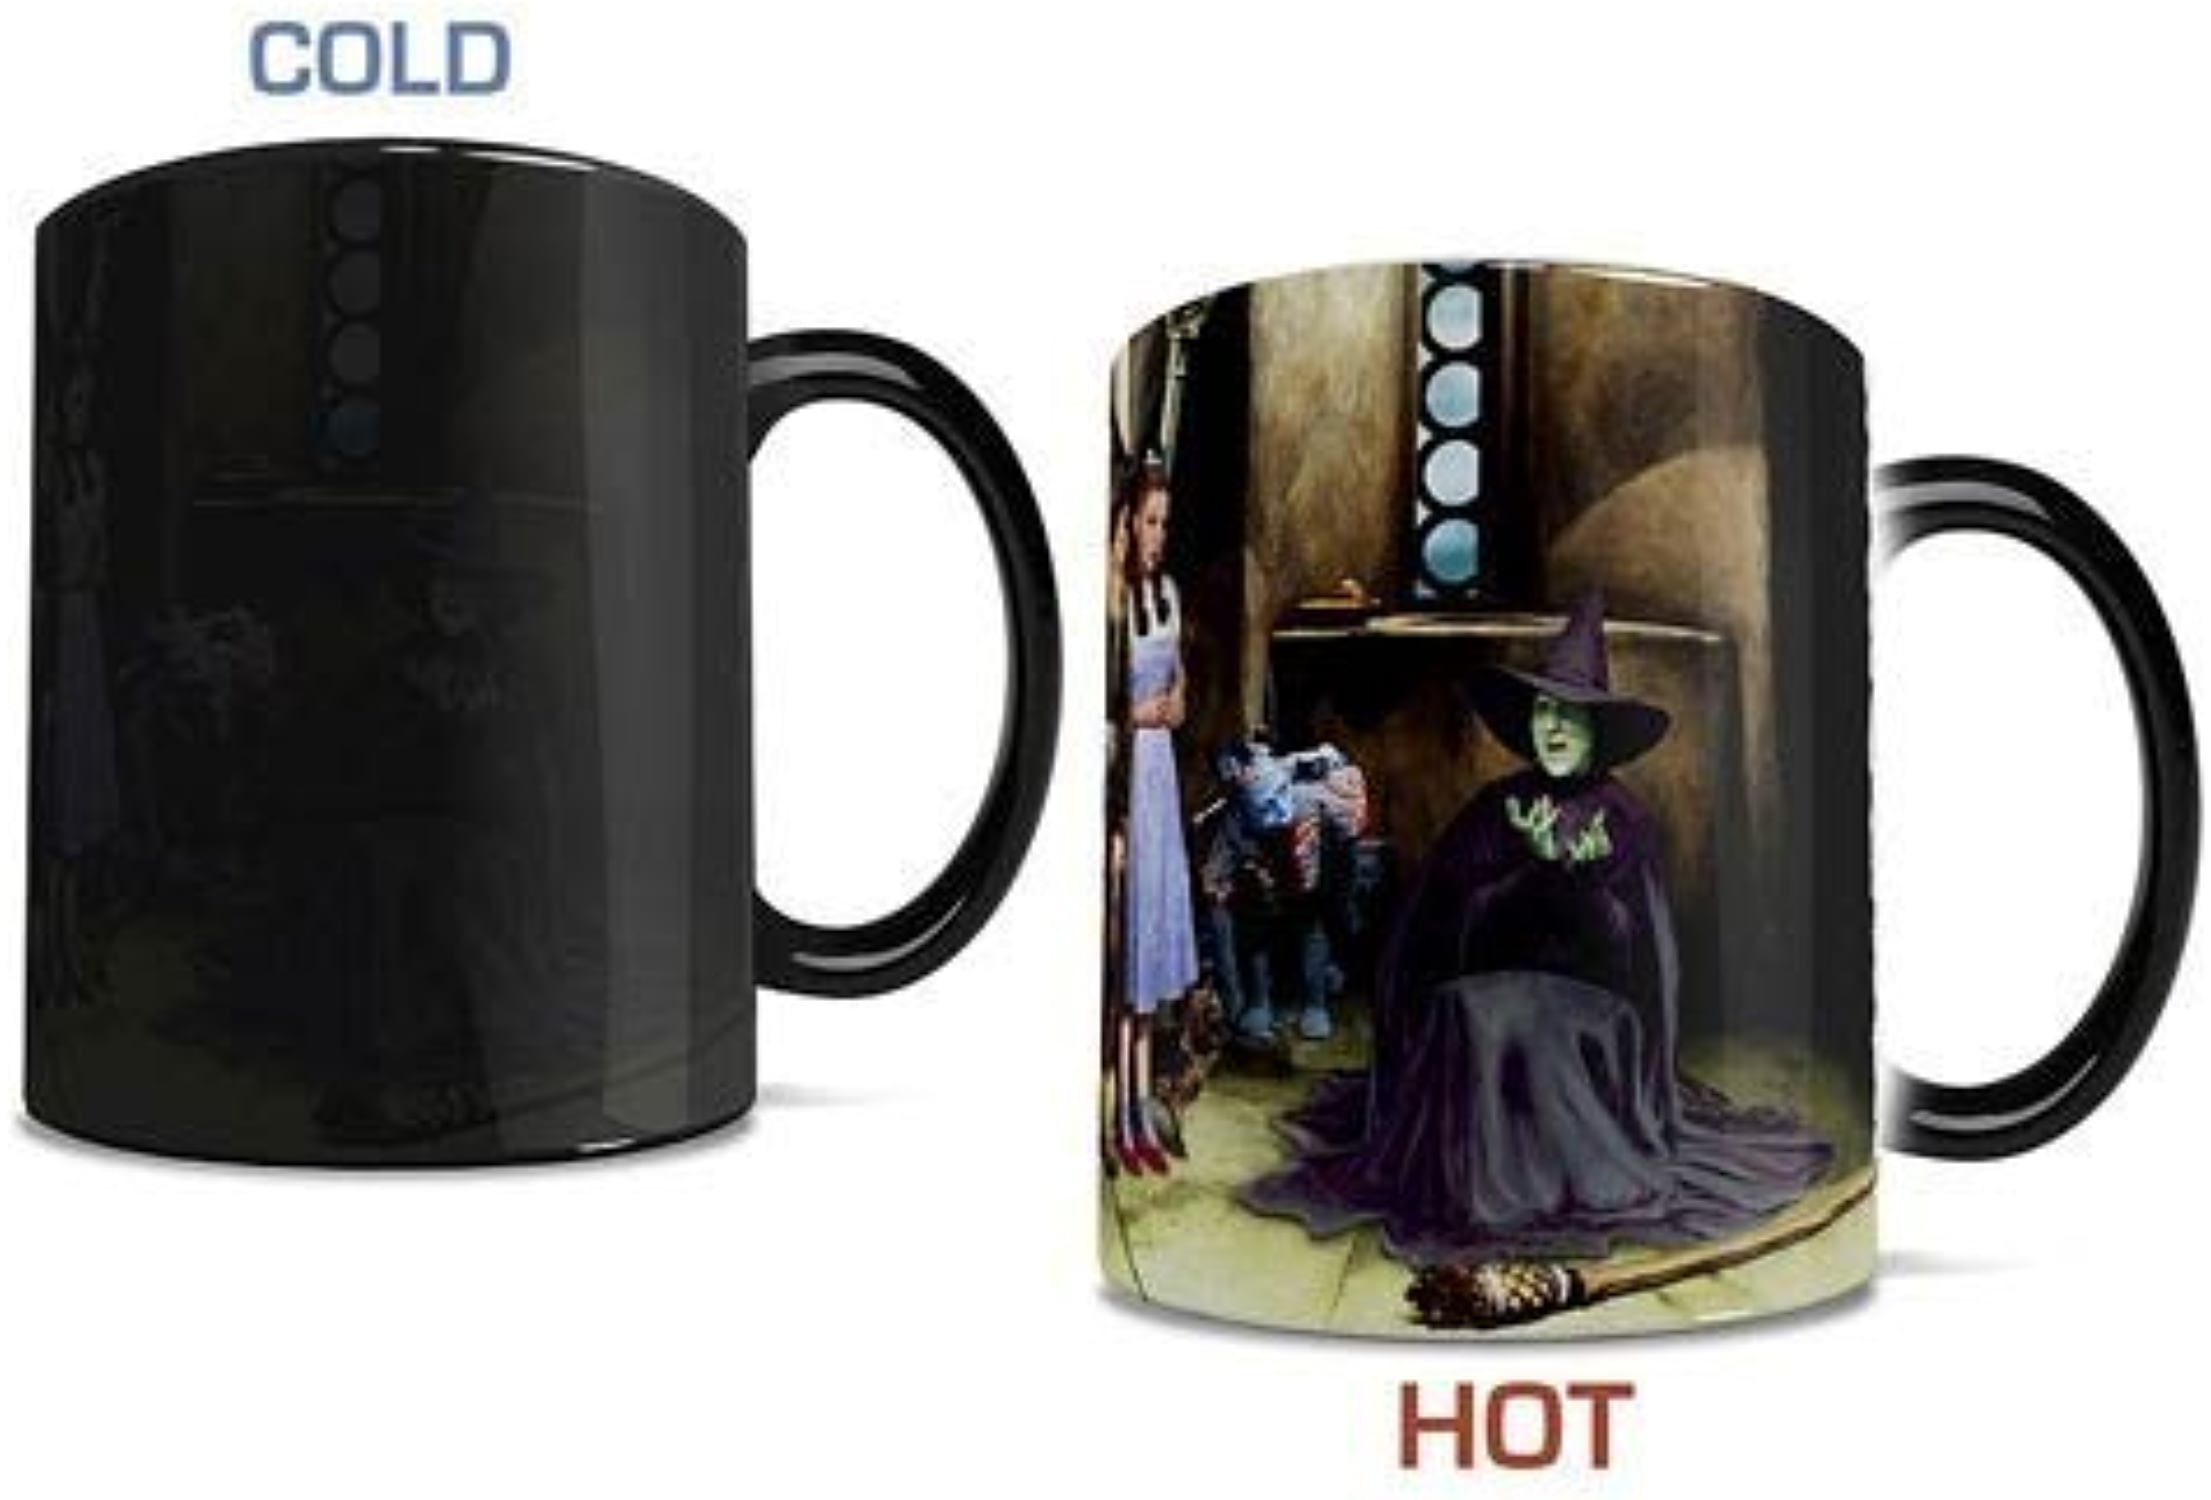 Morphing Mug Wizard of Oz 75th Anniversary (Melting Witch) Ceramic Mug, noir by Morphing Mug